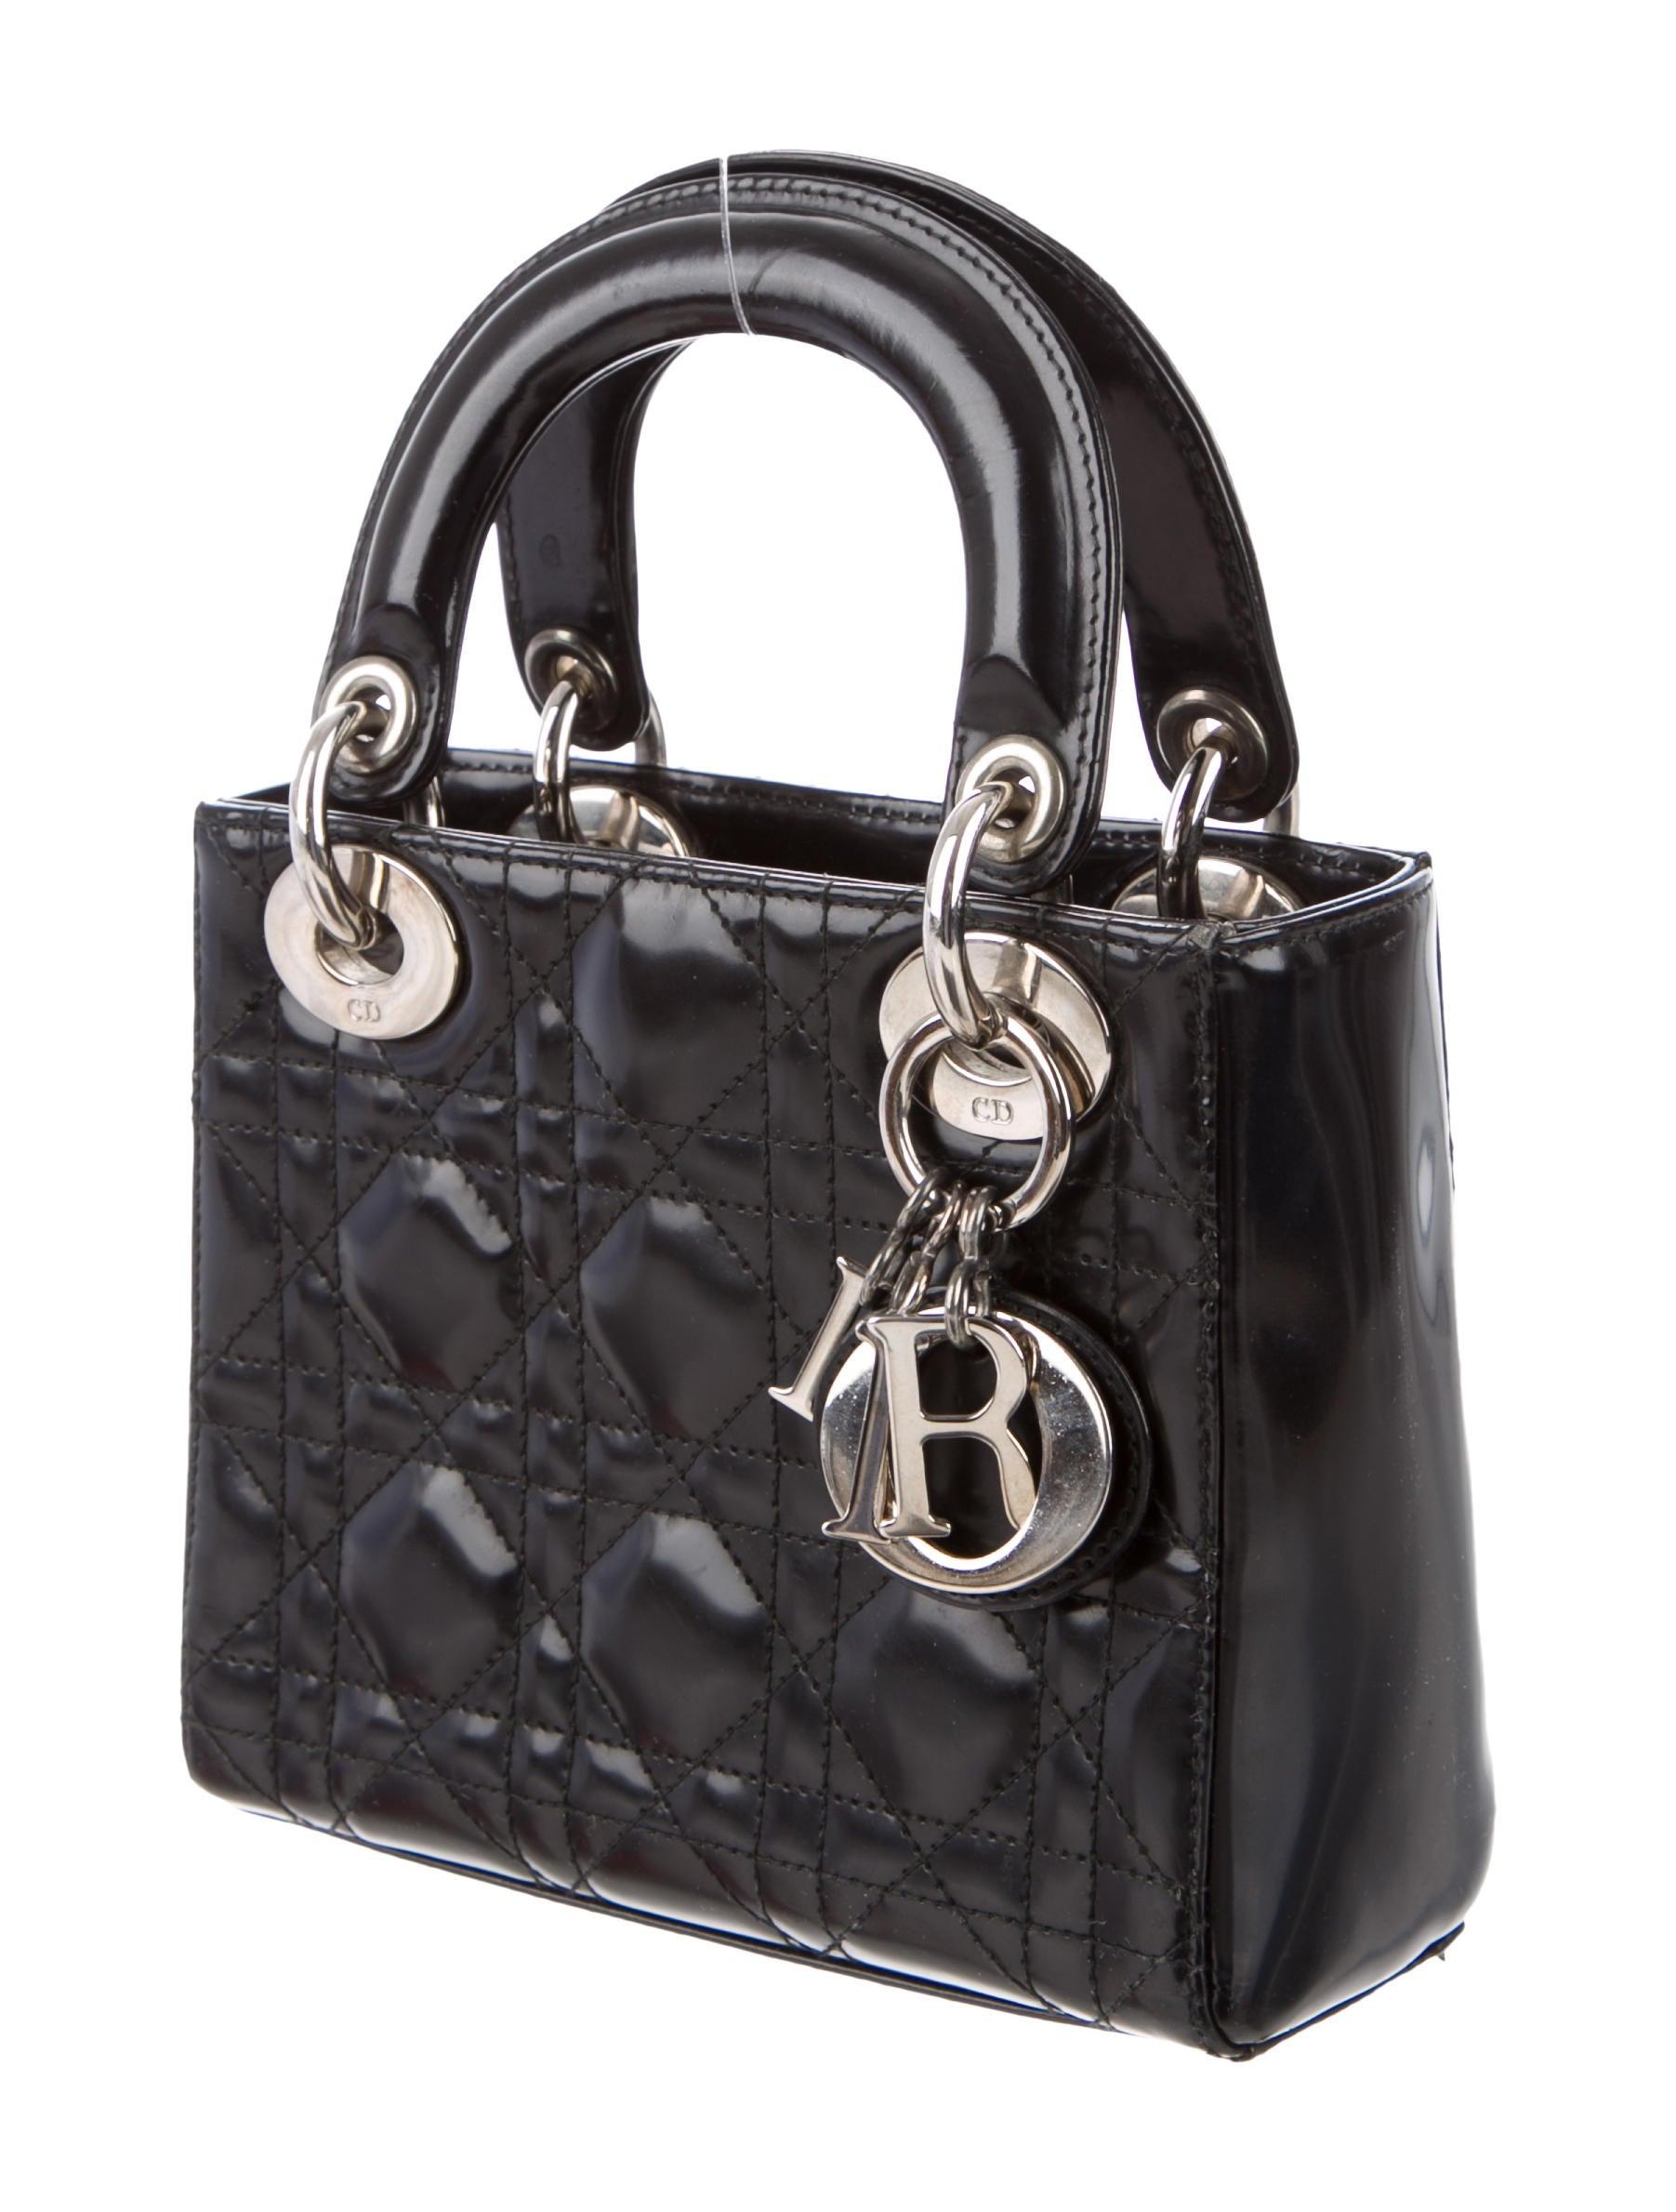 christian dior mini lady dior bag handbags chr44621 the realreal. Black Bedroom Furniture Sets. Home Design Ideas